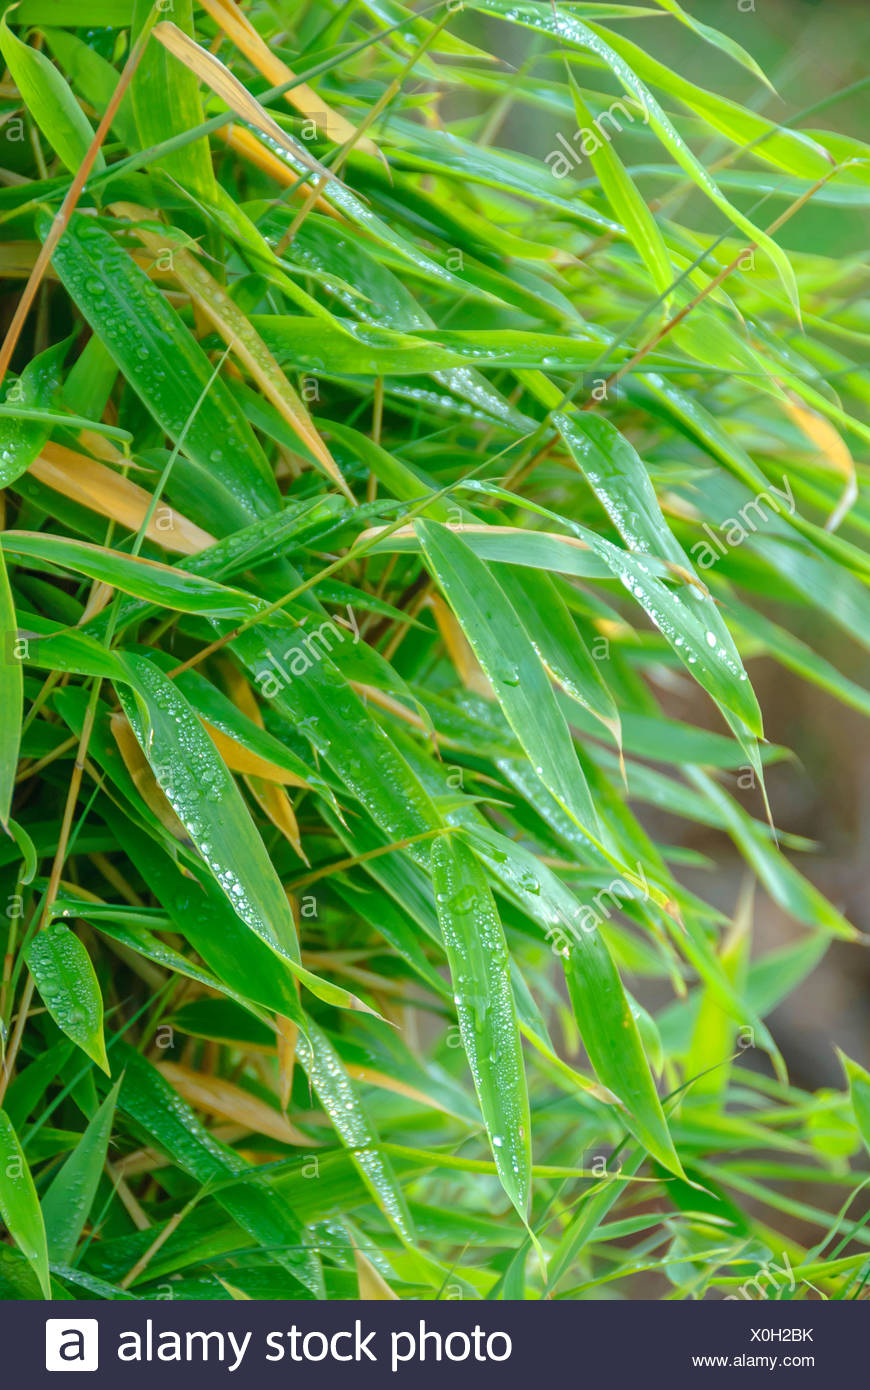 Muriels Bamboo (Fargesia murieliae 'Jumbo', Fargesia murieliae Jumbo), leaves in rain - Stock Image